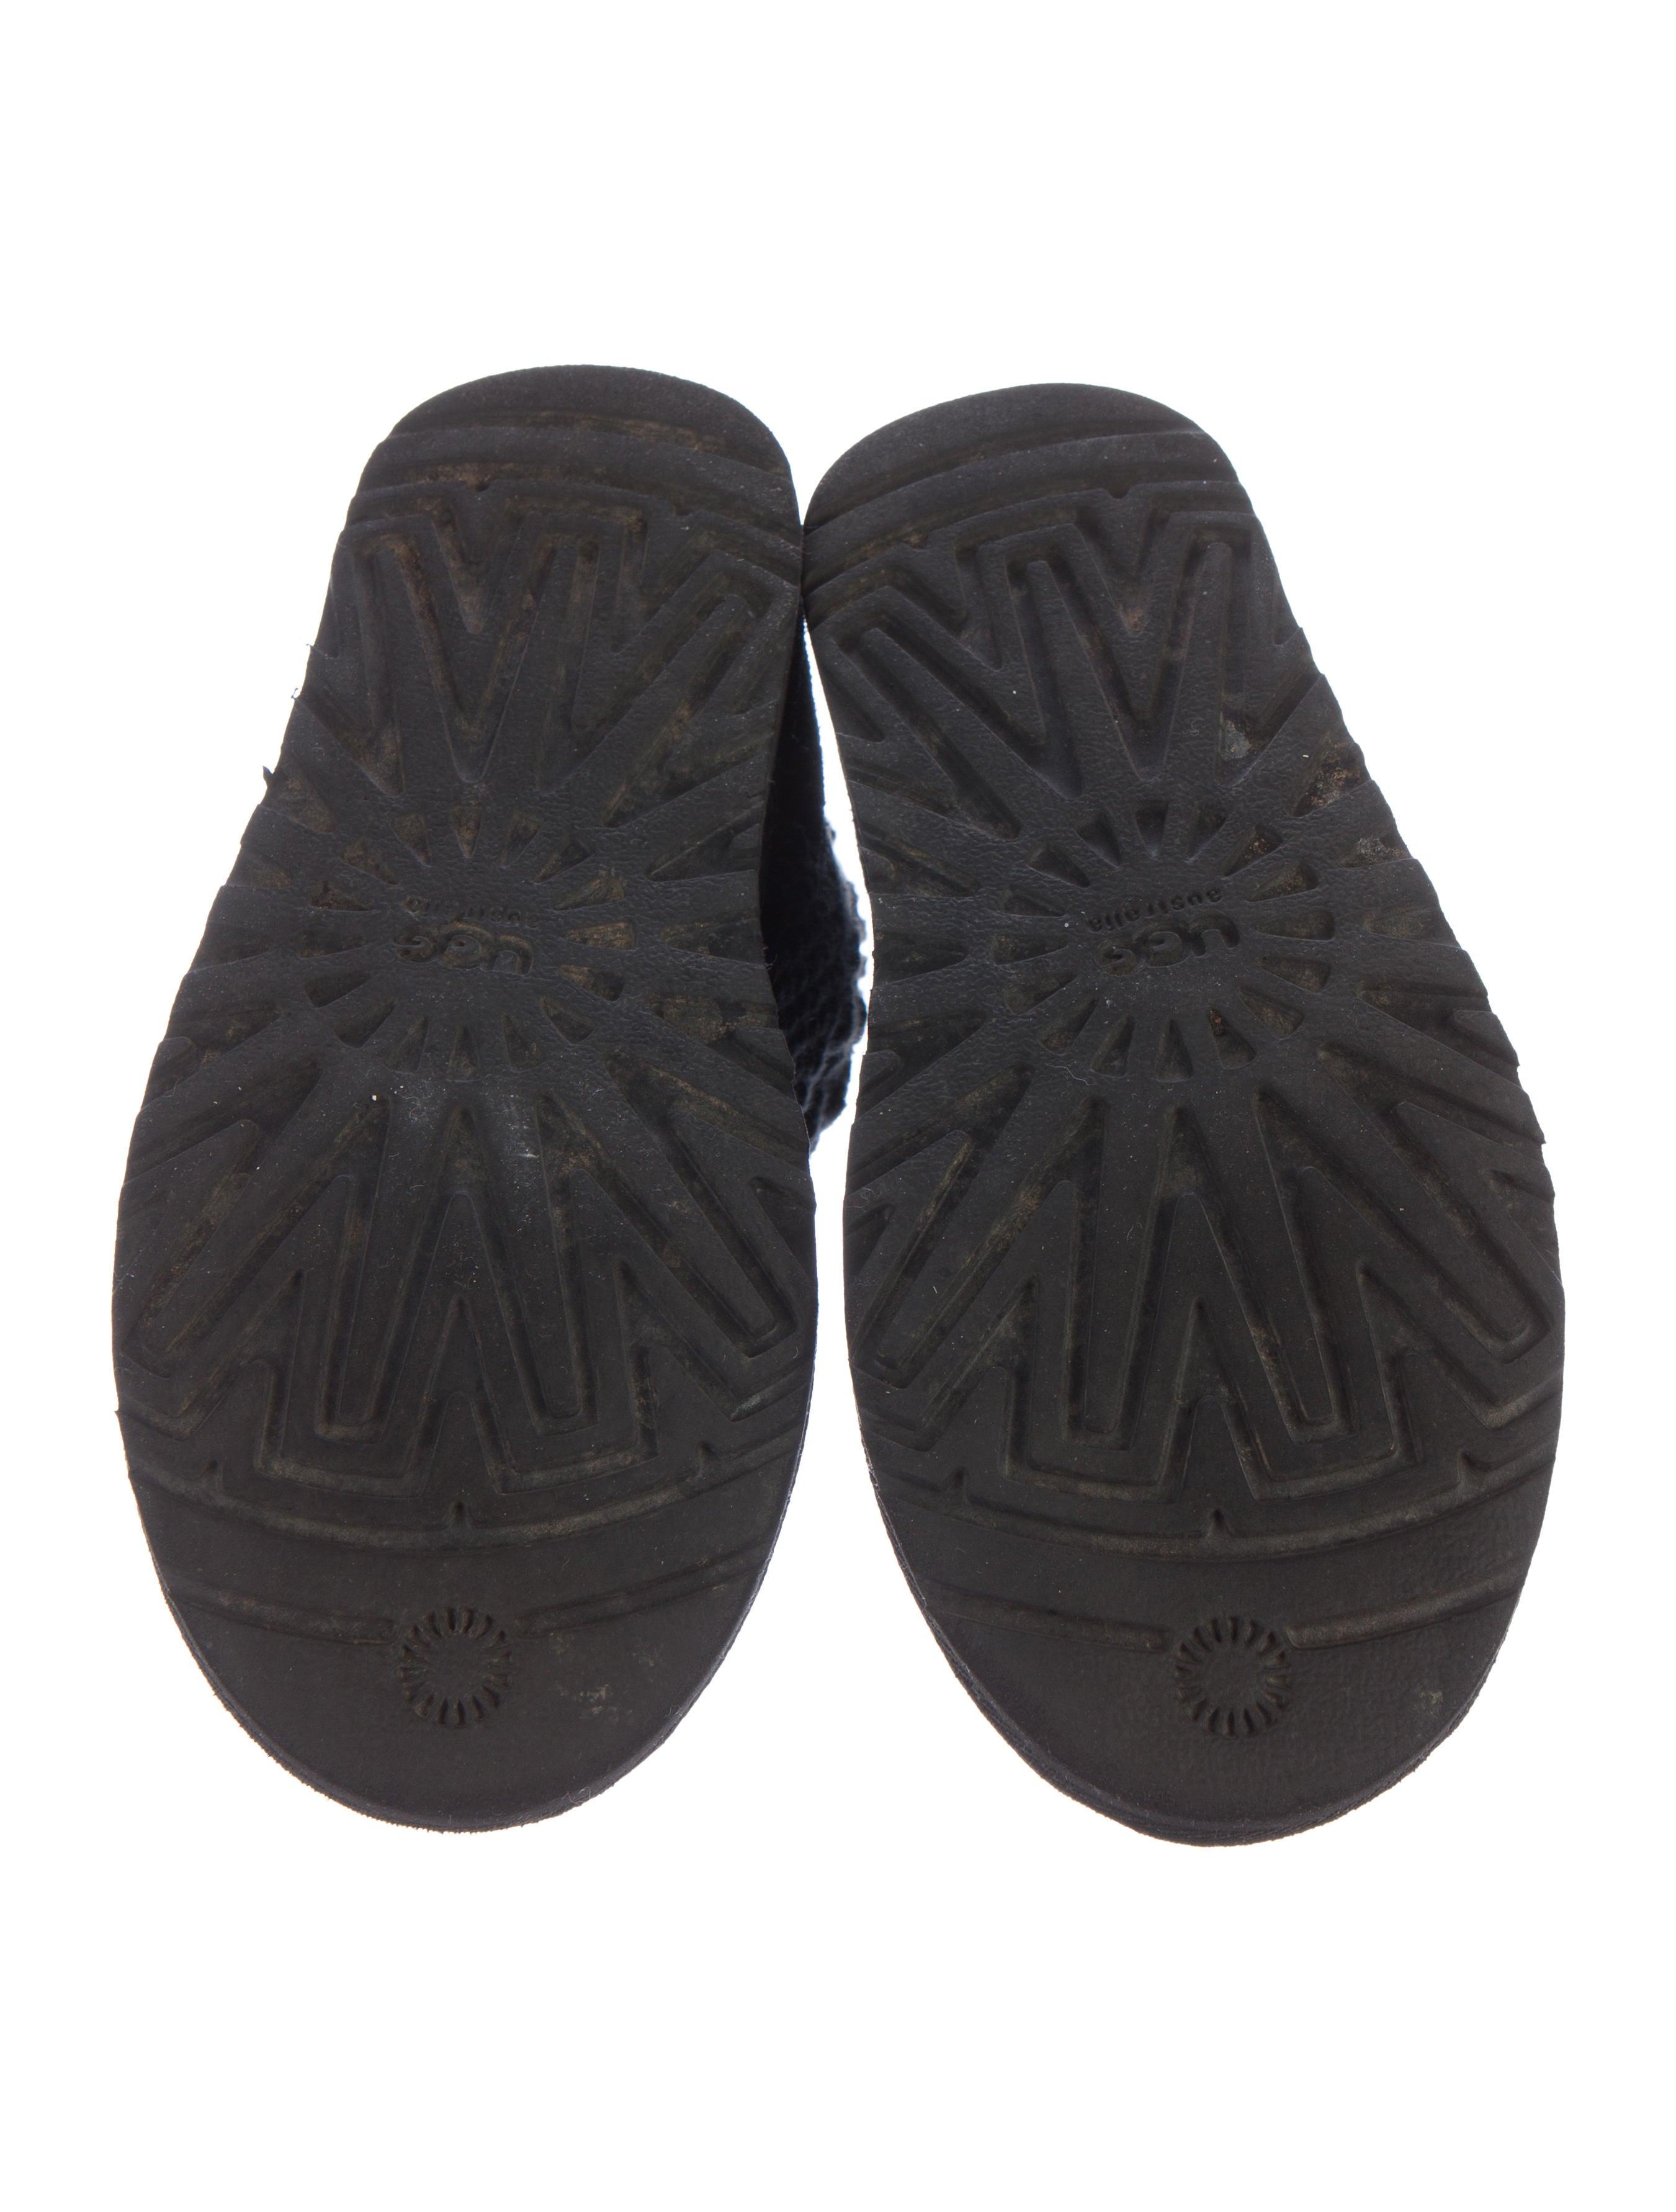 ce6840b7155 Ugg Classic Argyle Knit Boots - cheap watches mgc-gas.com